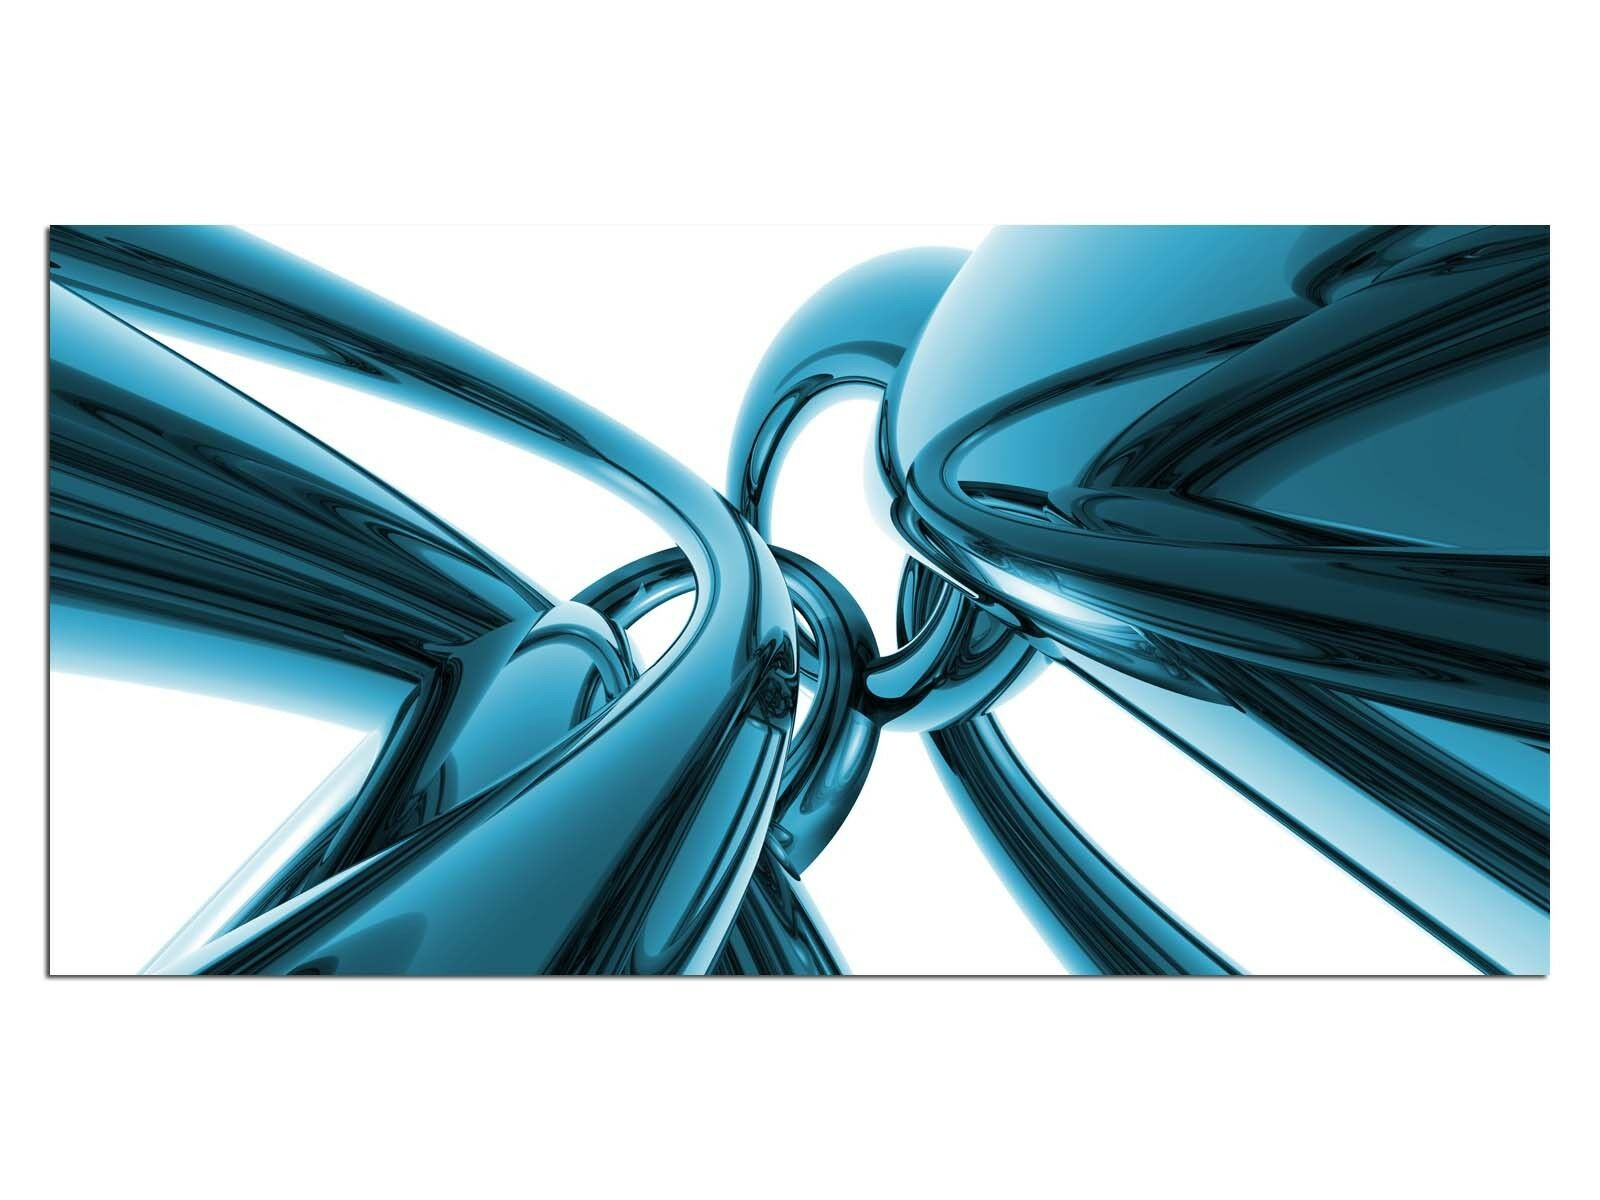 Deco De Vidrio Imagen eg4100500728 Cromado Diseño Azul Tamaño 39,37  X 19,68  Hd Print